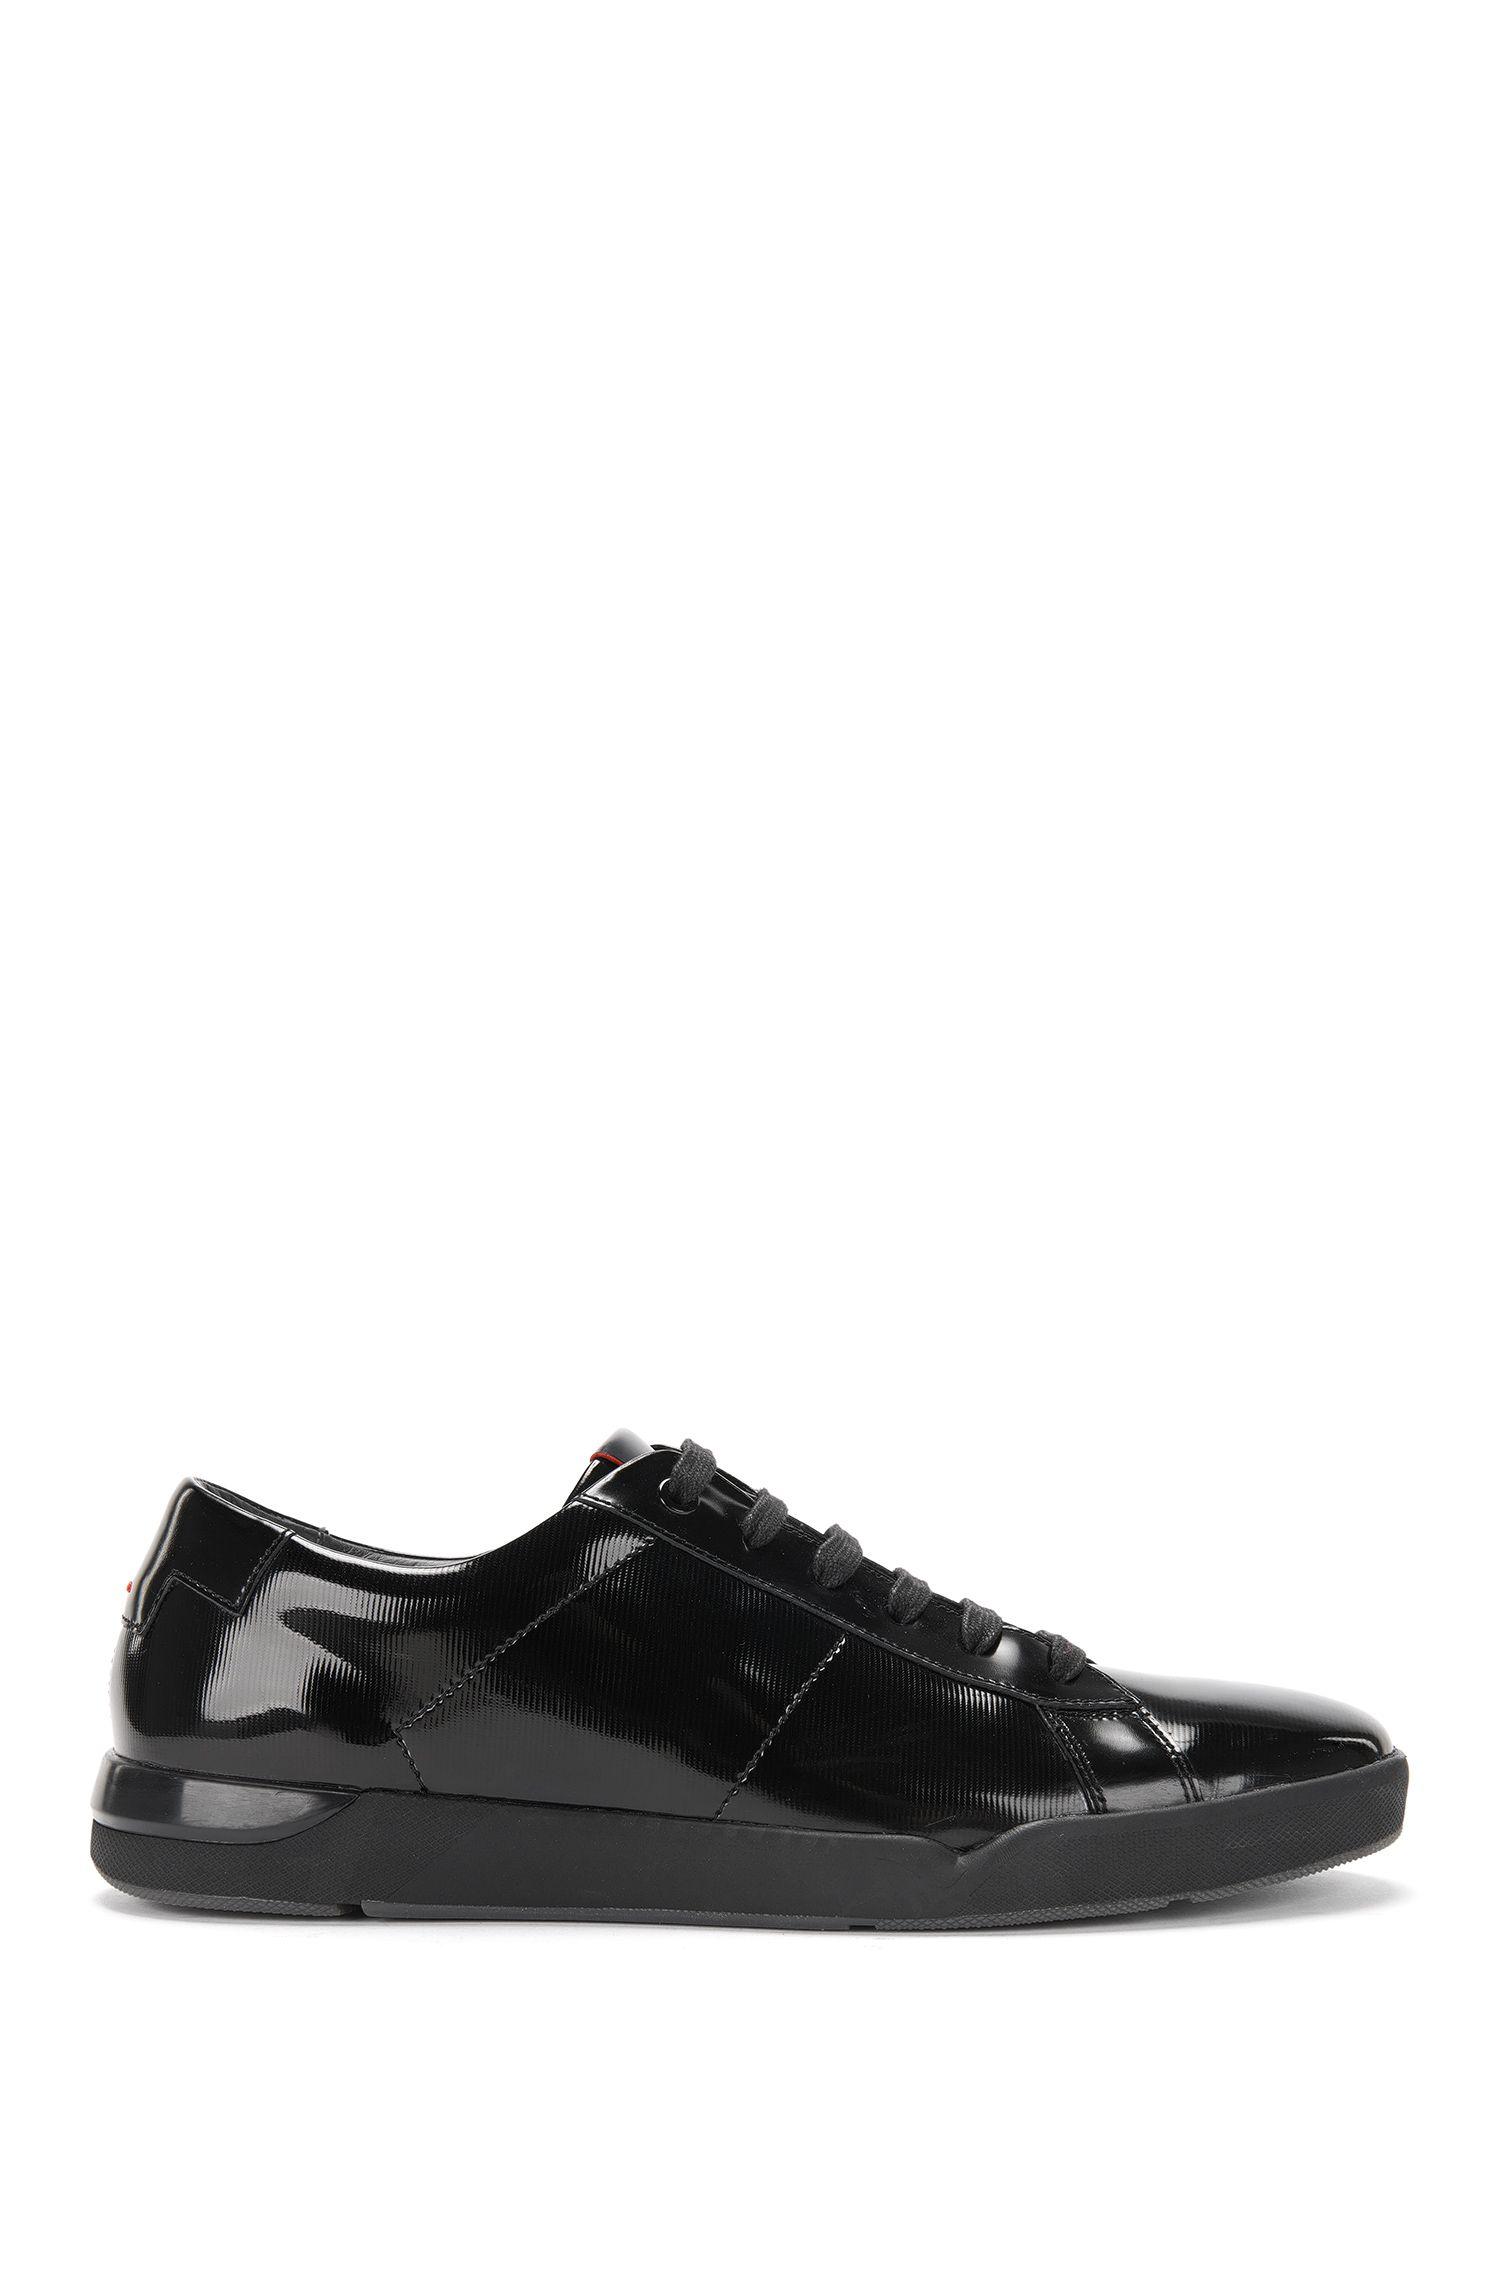 Unifarbene Sneakers aus Lackleder: 'Fusion_Tenn_paml'